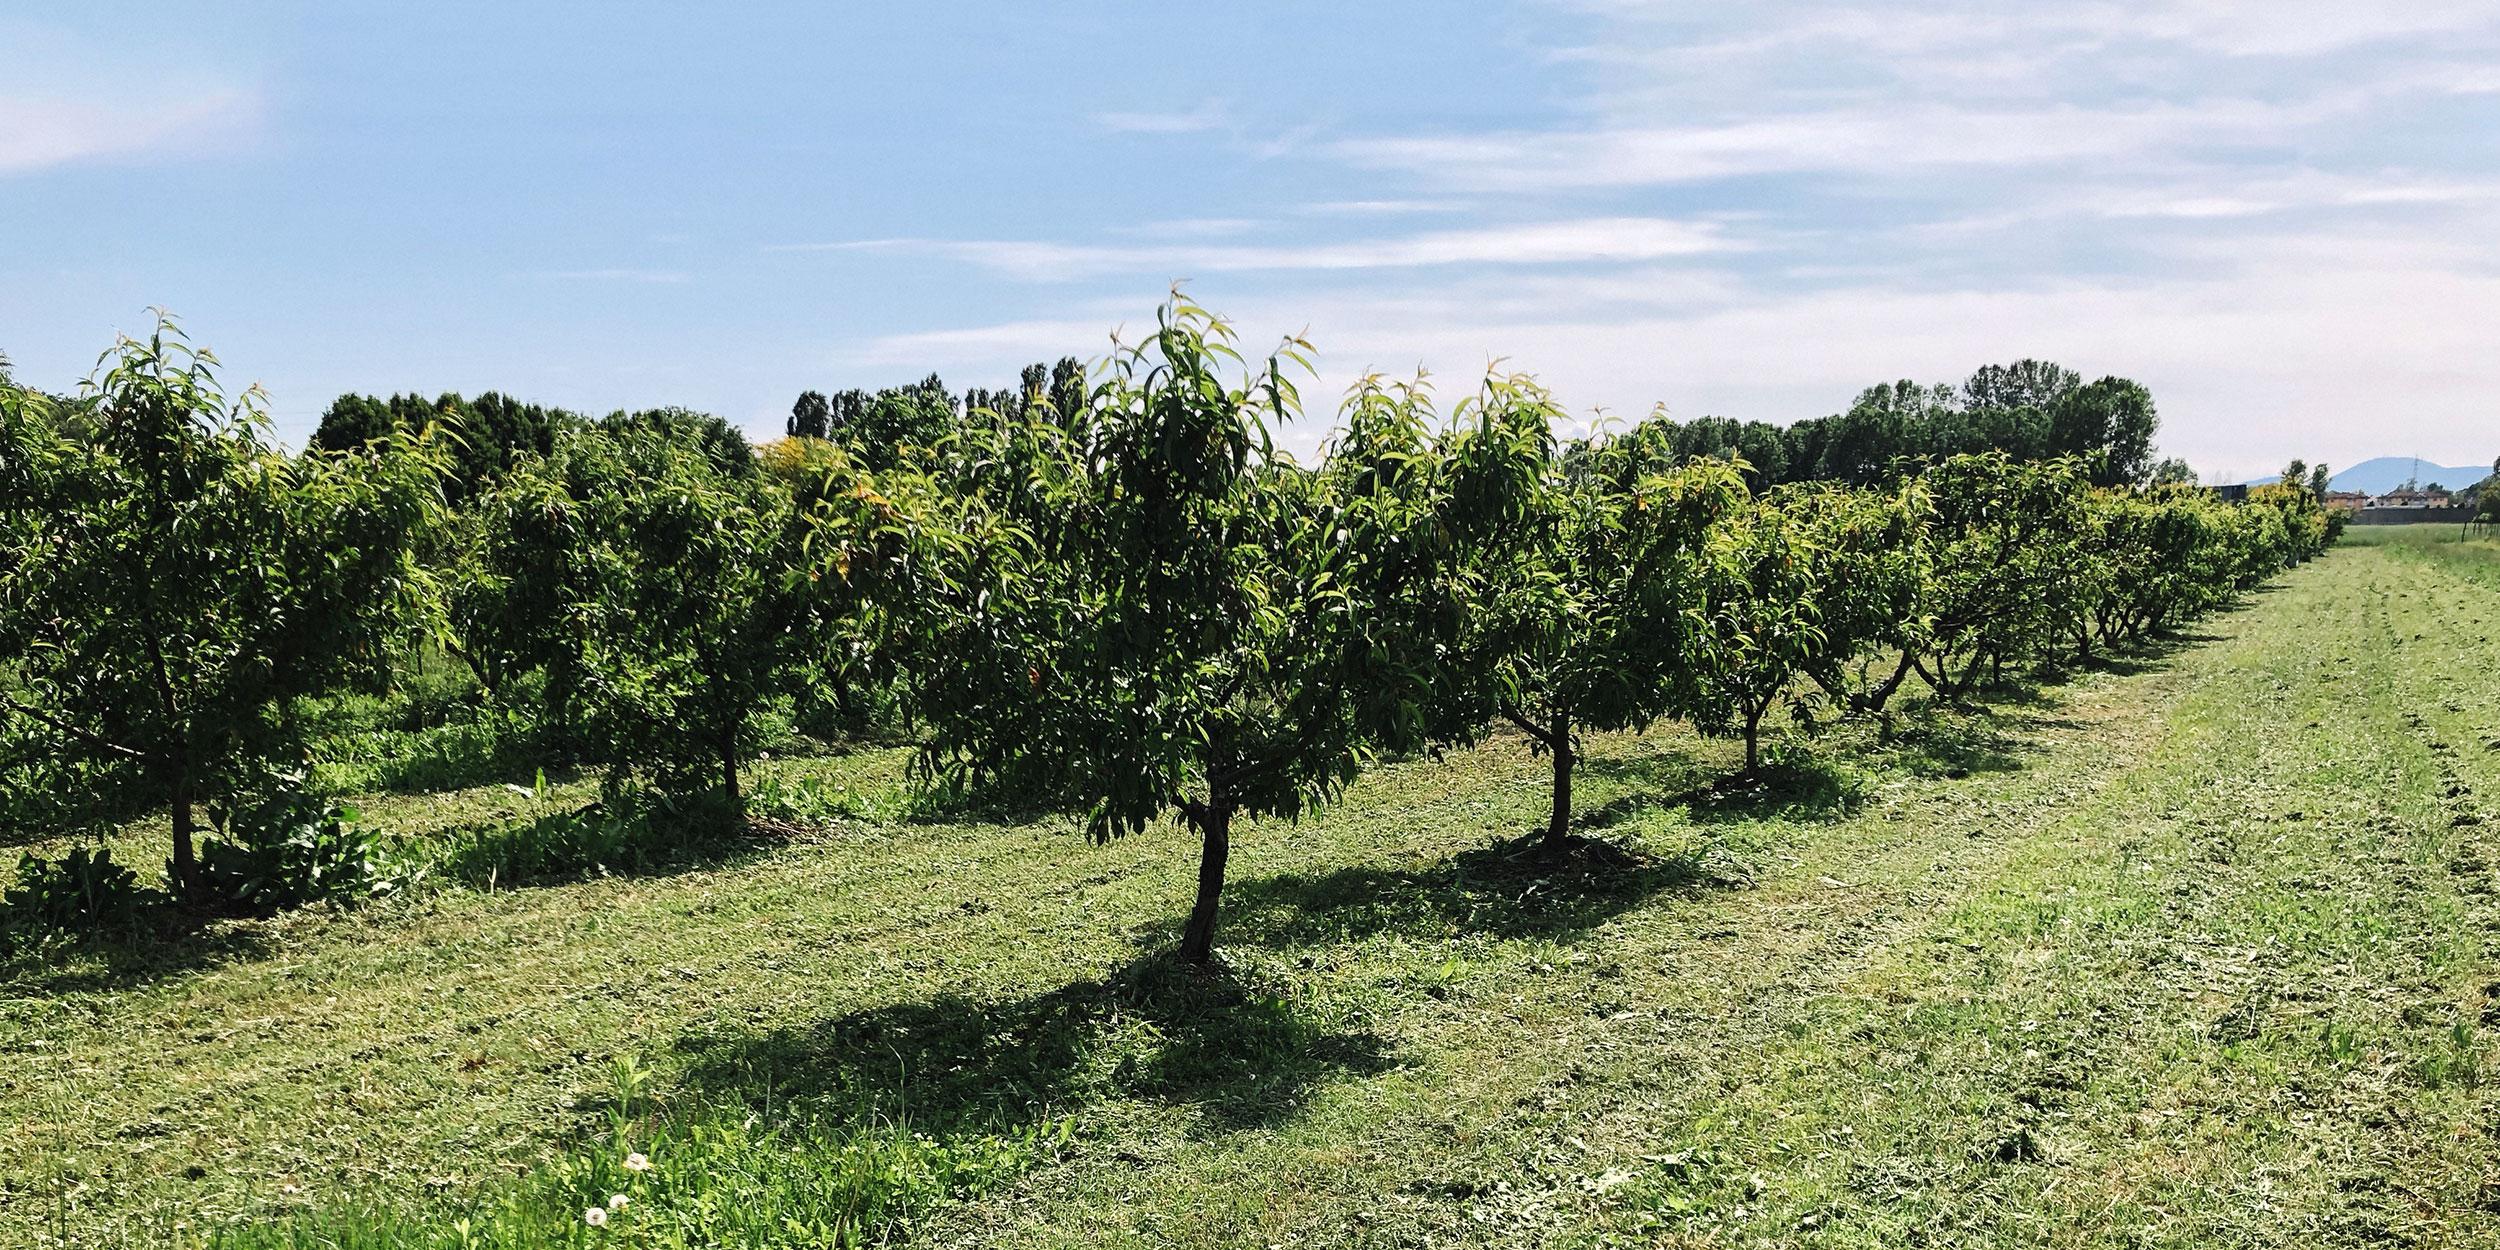 Crak birrificio artigianale agricolo